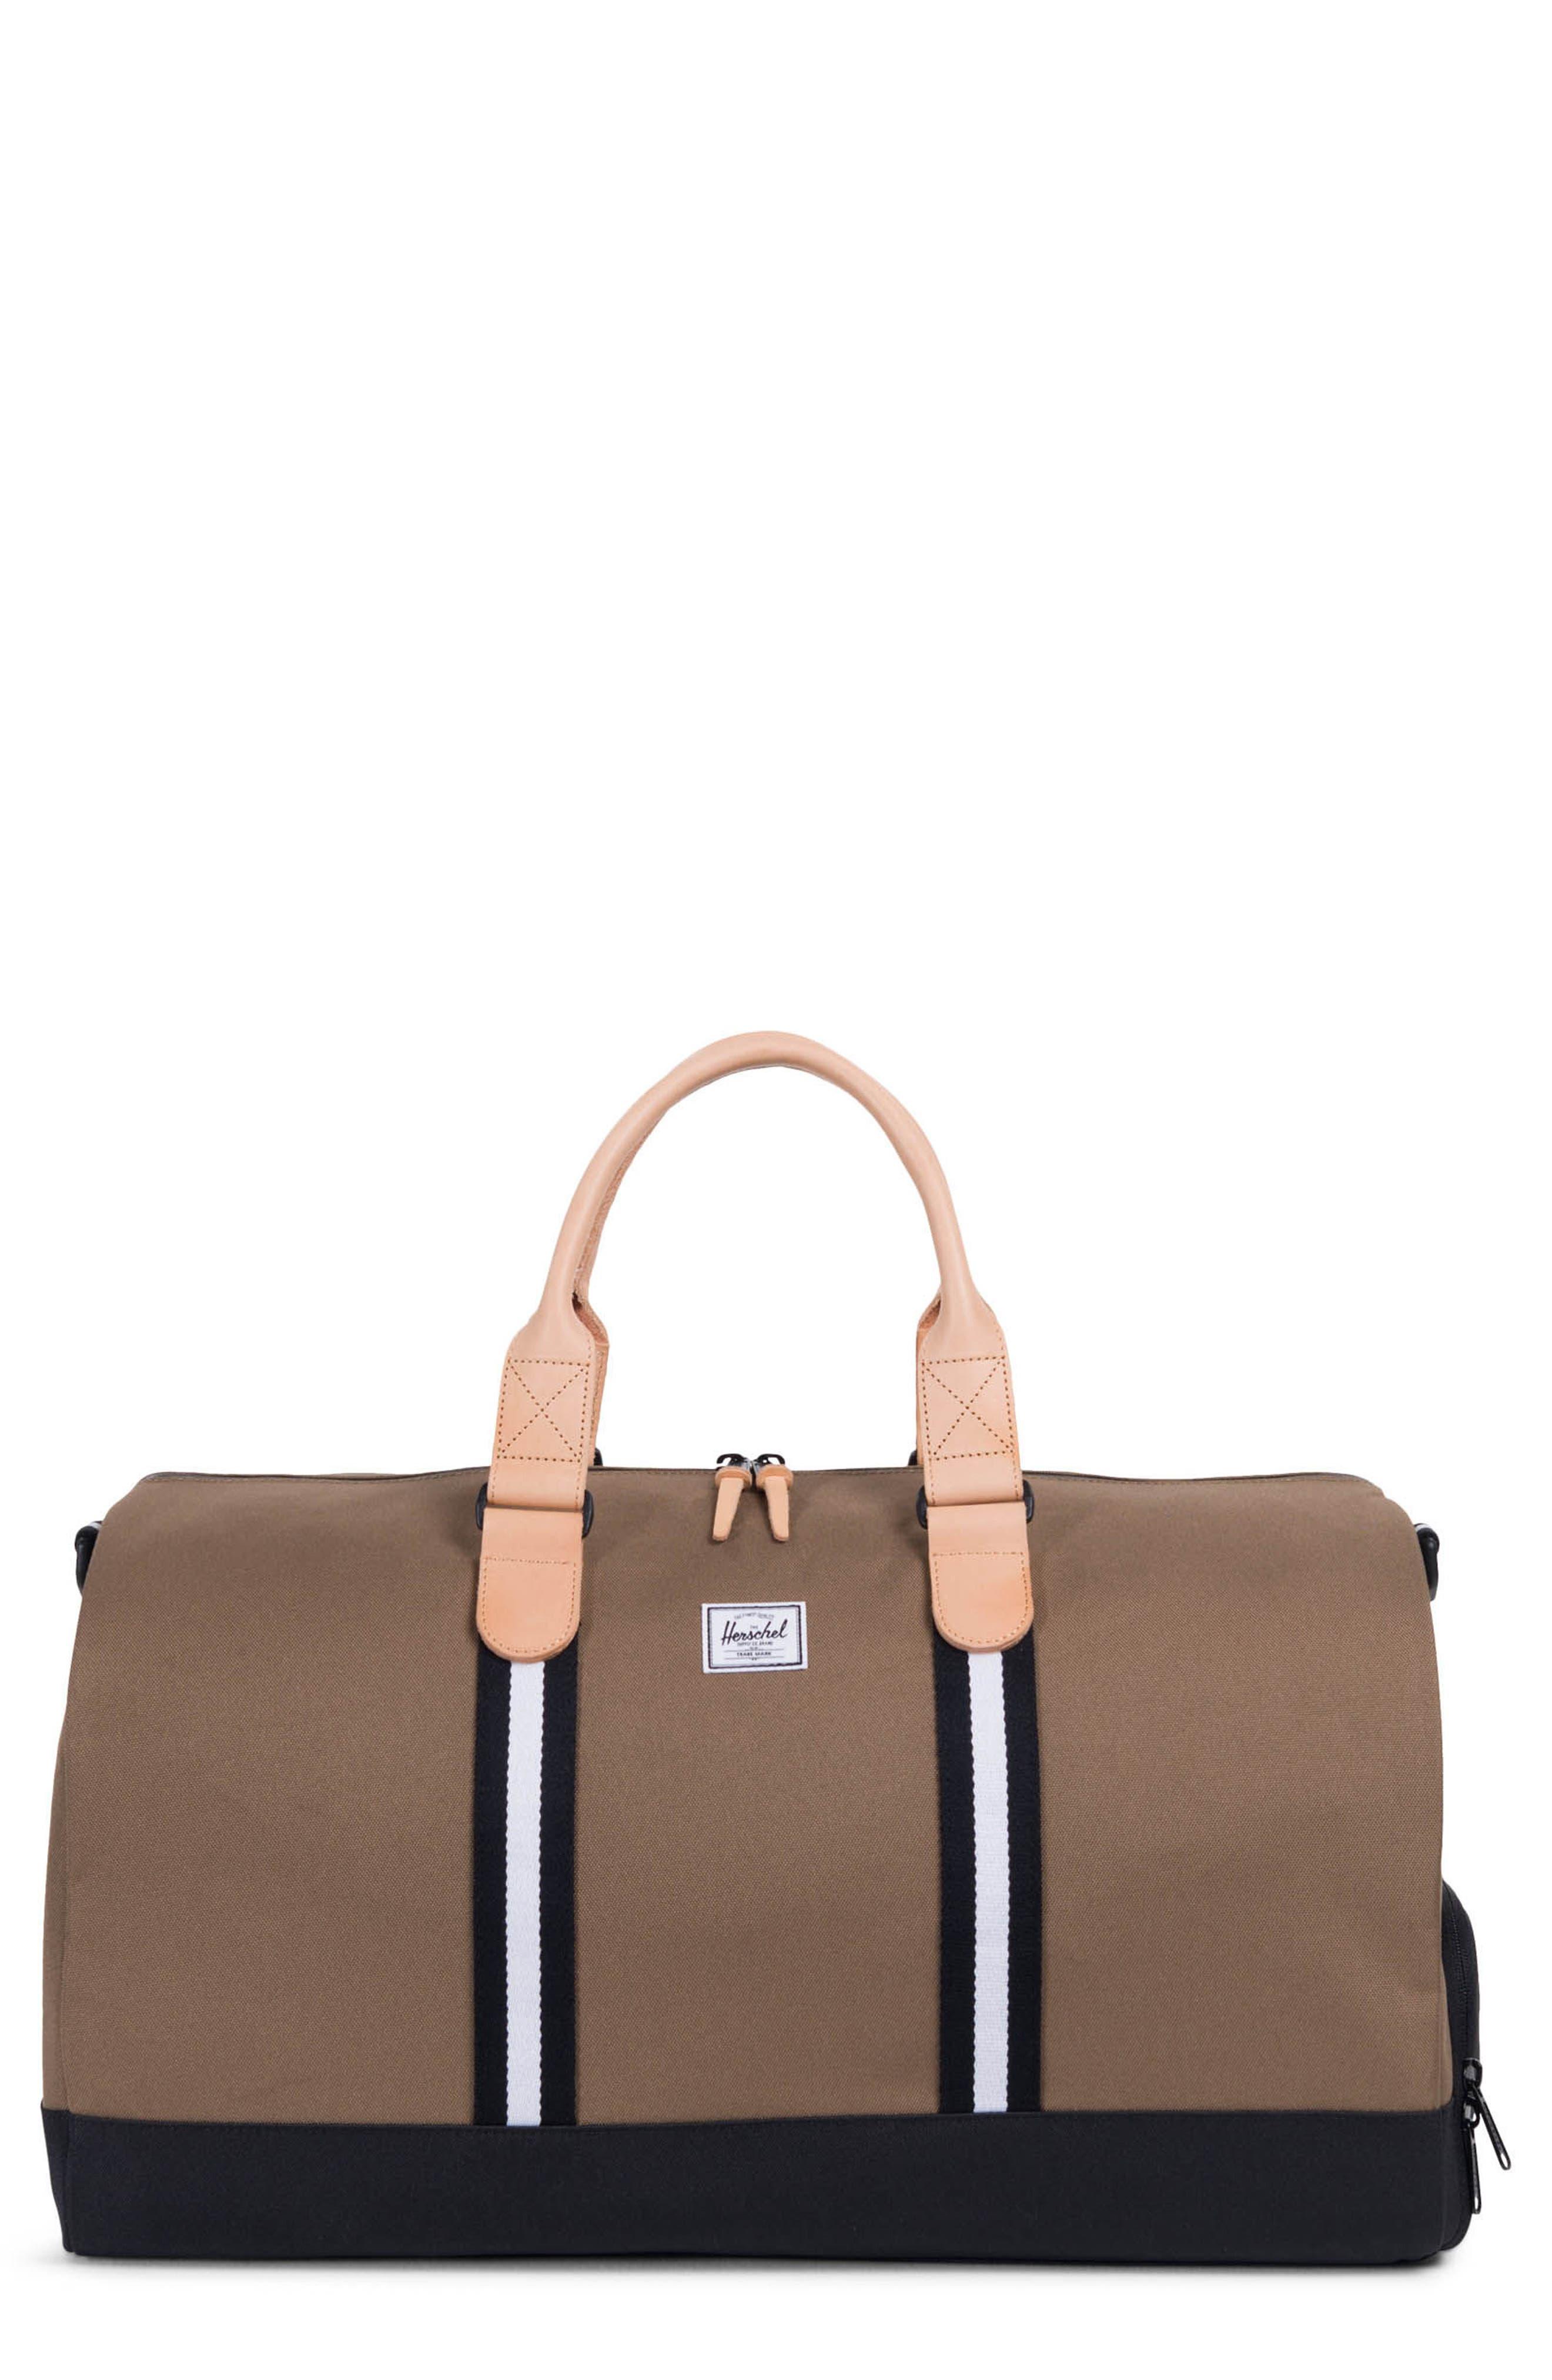 Novel Duffel Bag,                         Main,                         color, 205